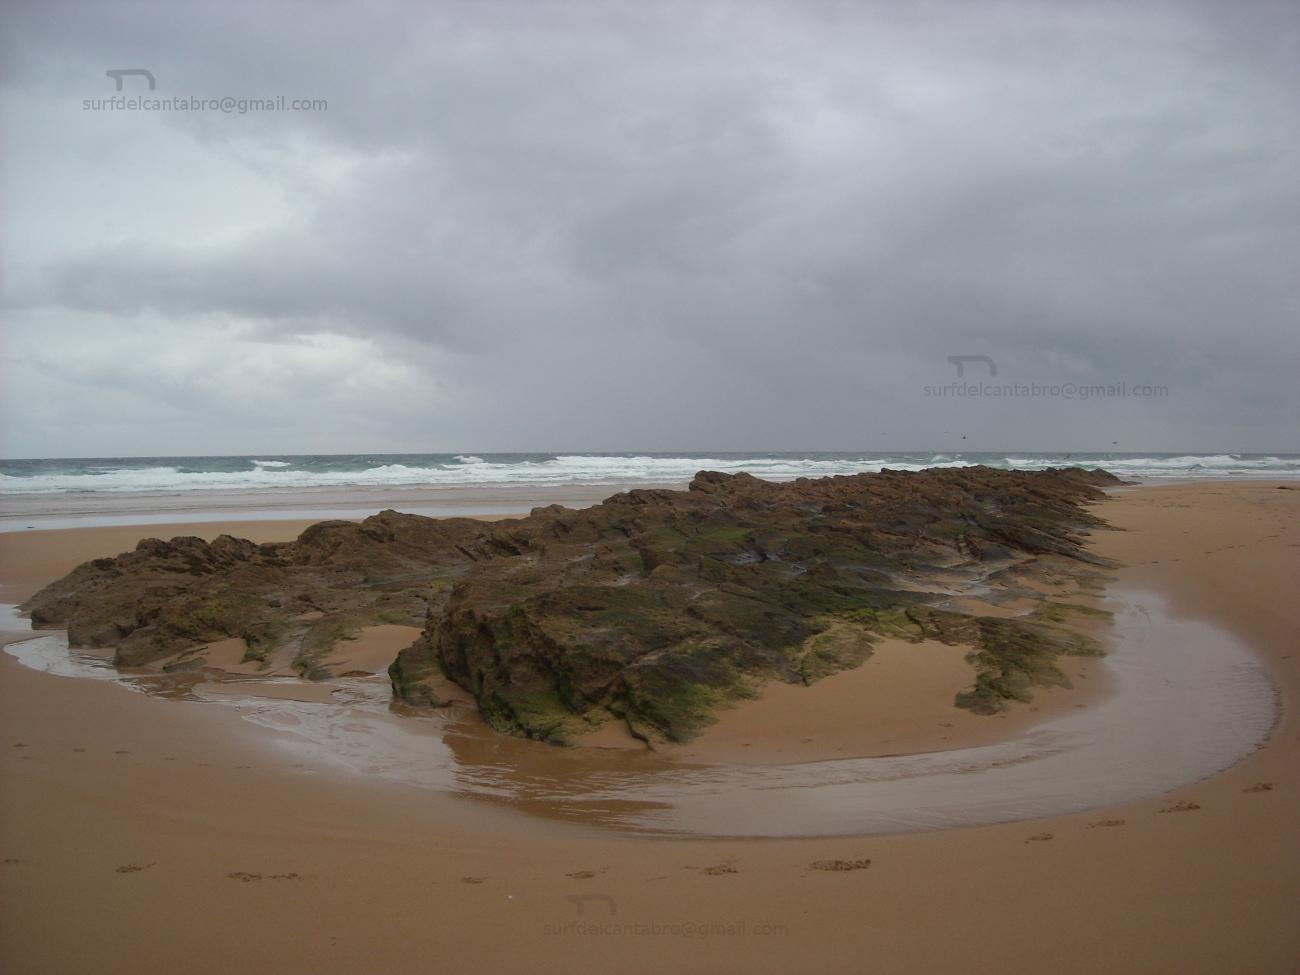 shore & rocks